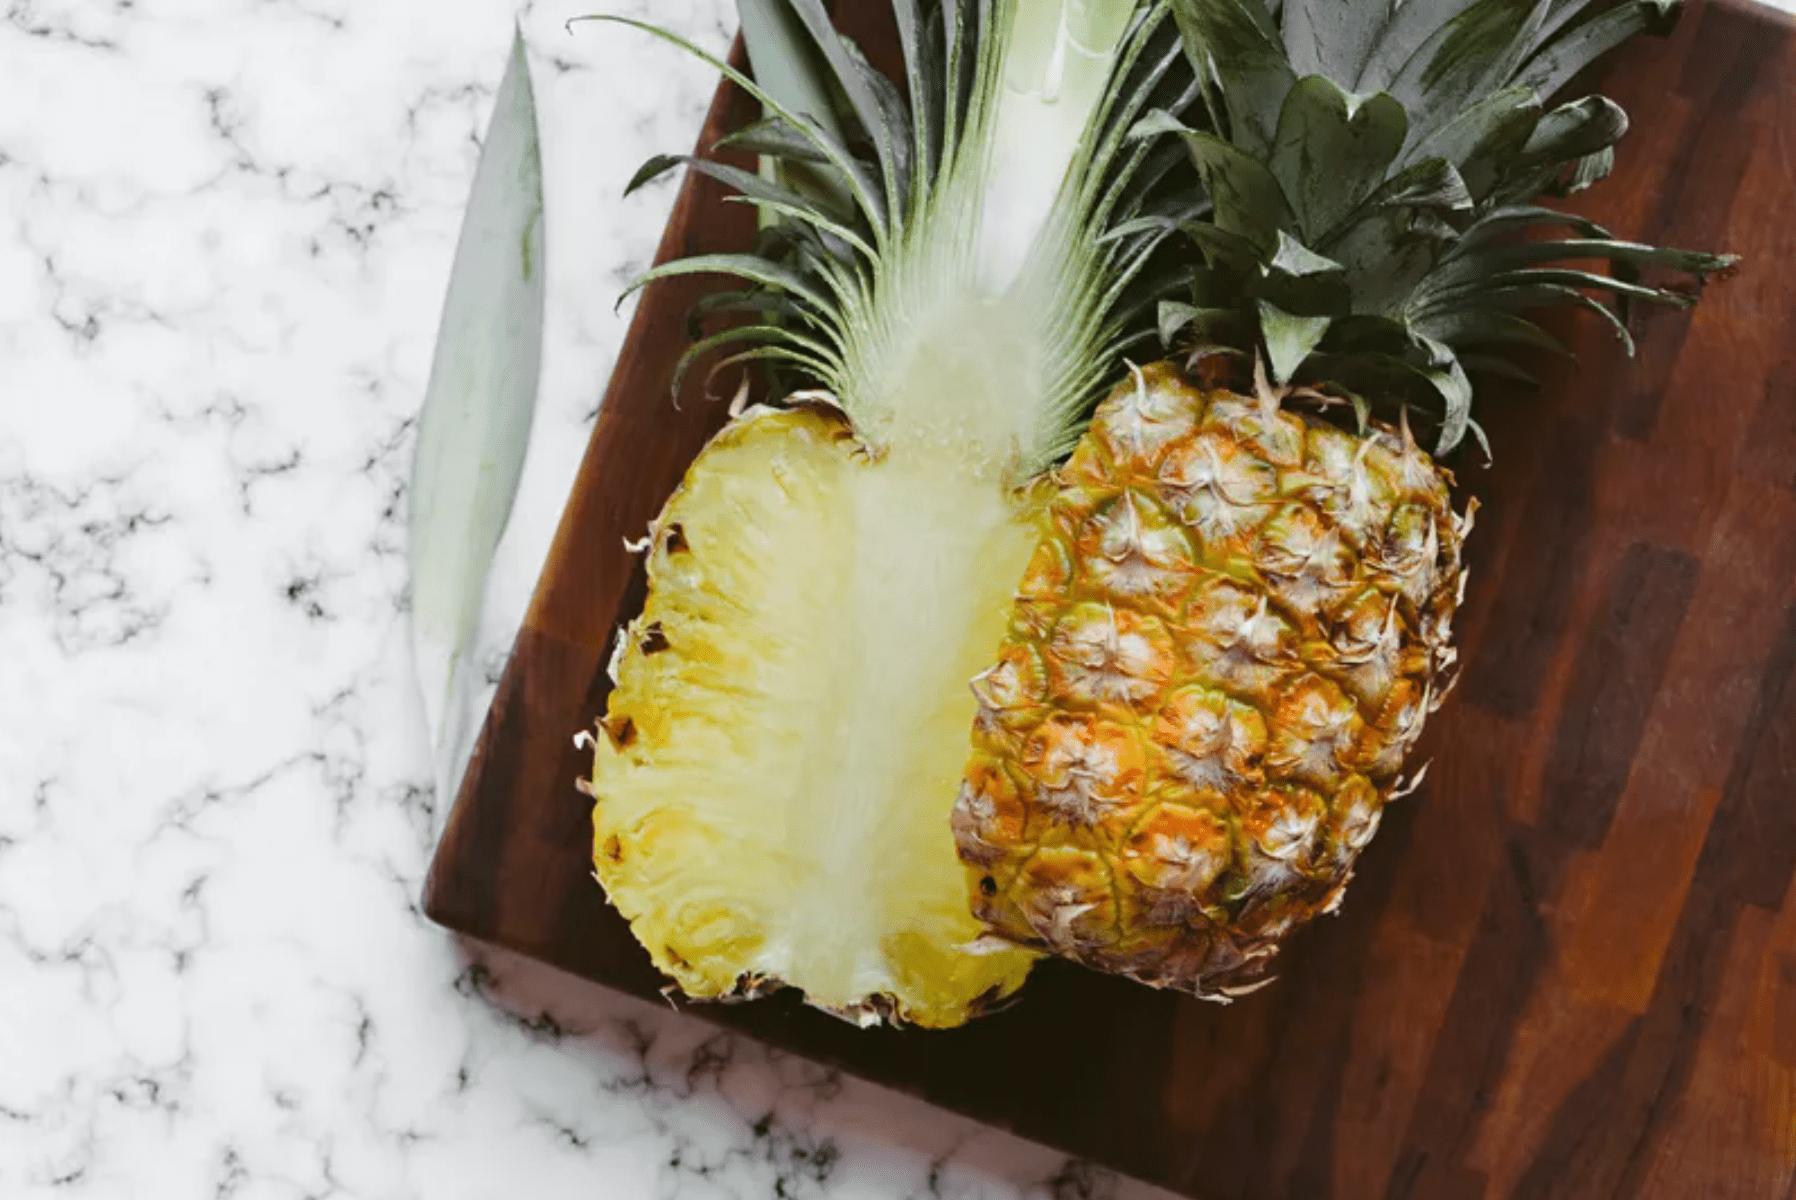 Pineapple Supply Co. on Unsplash